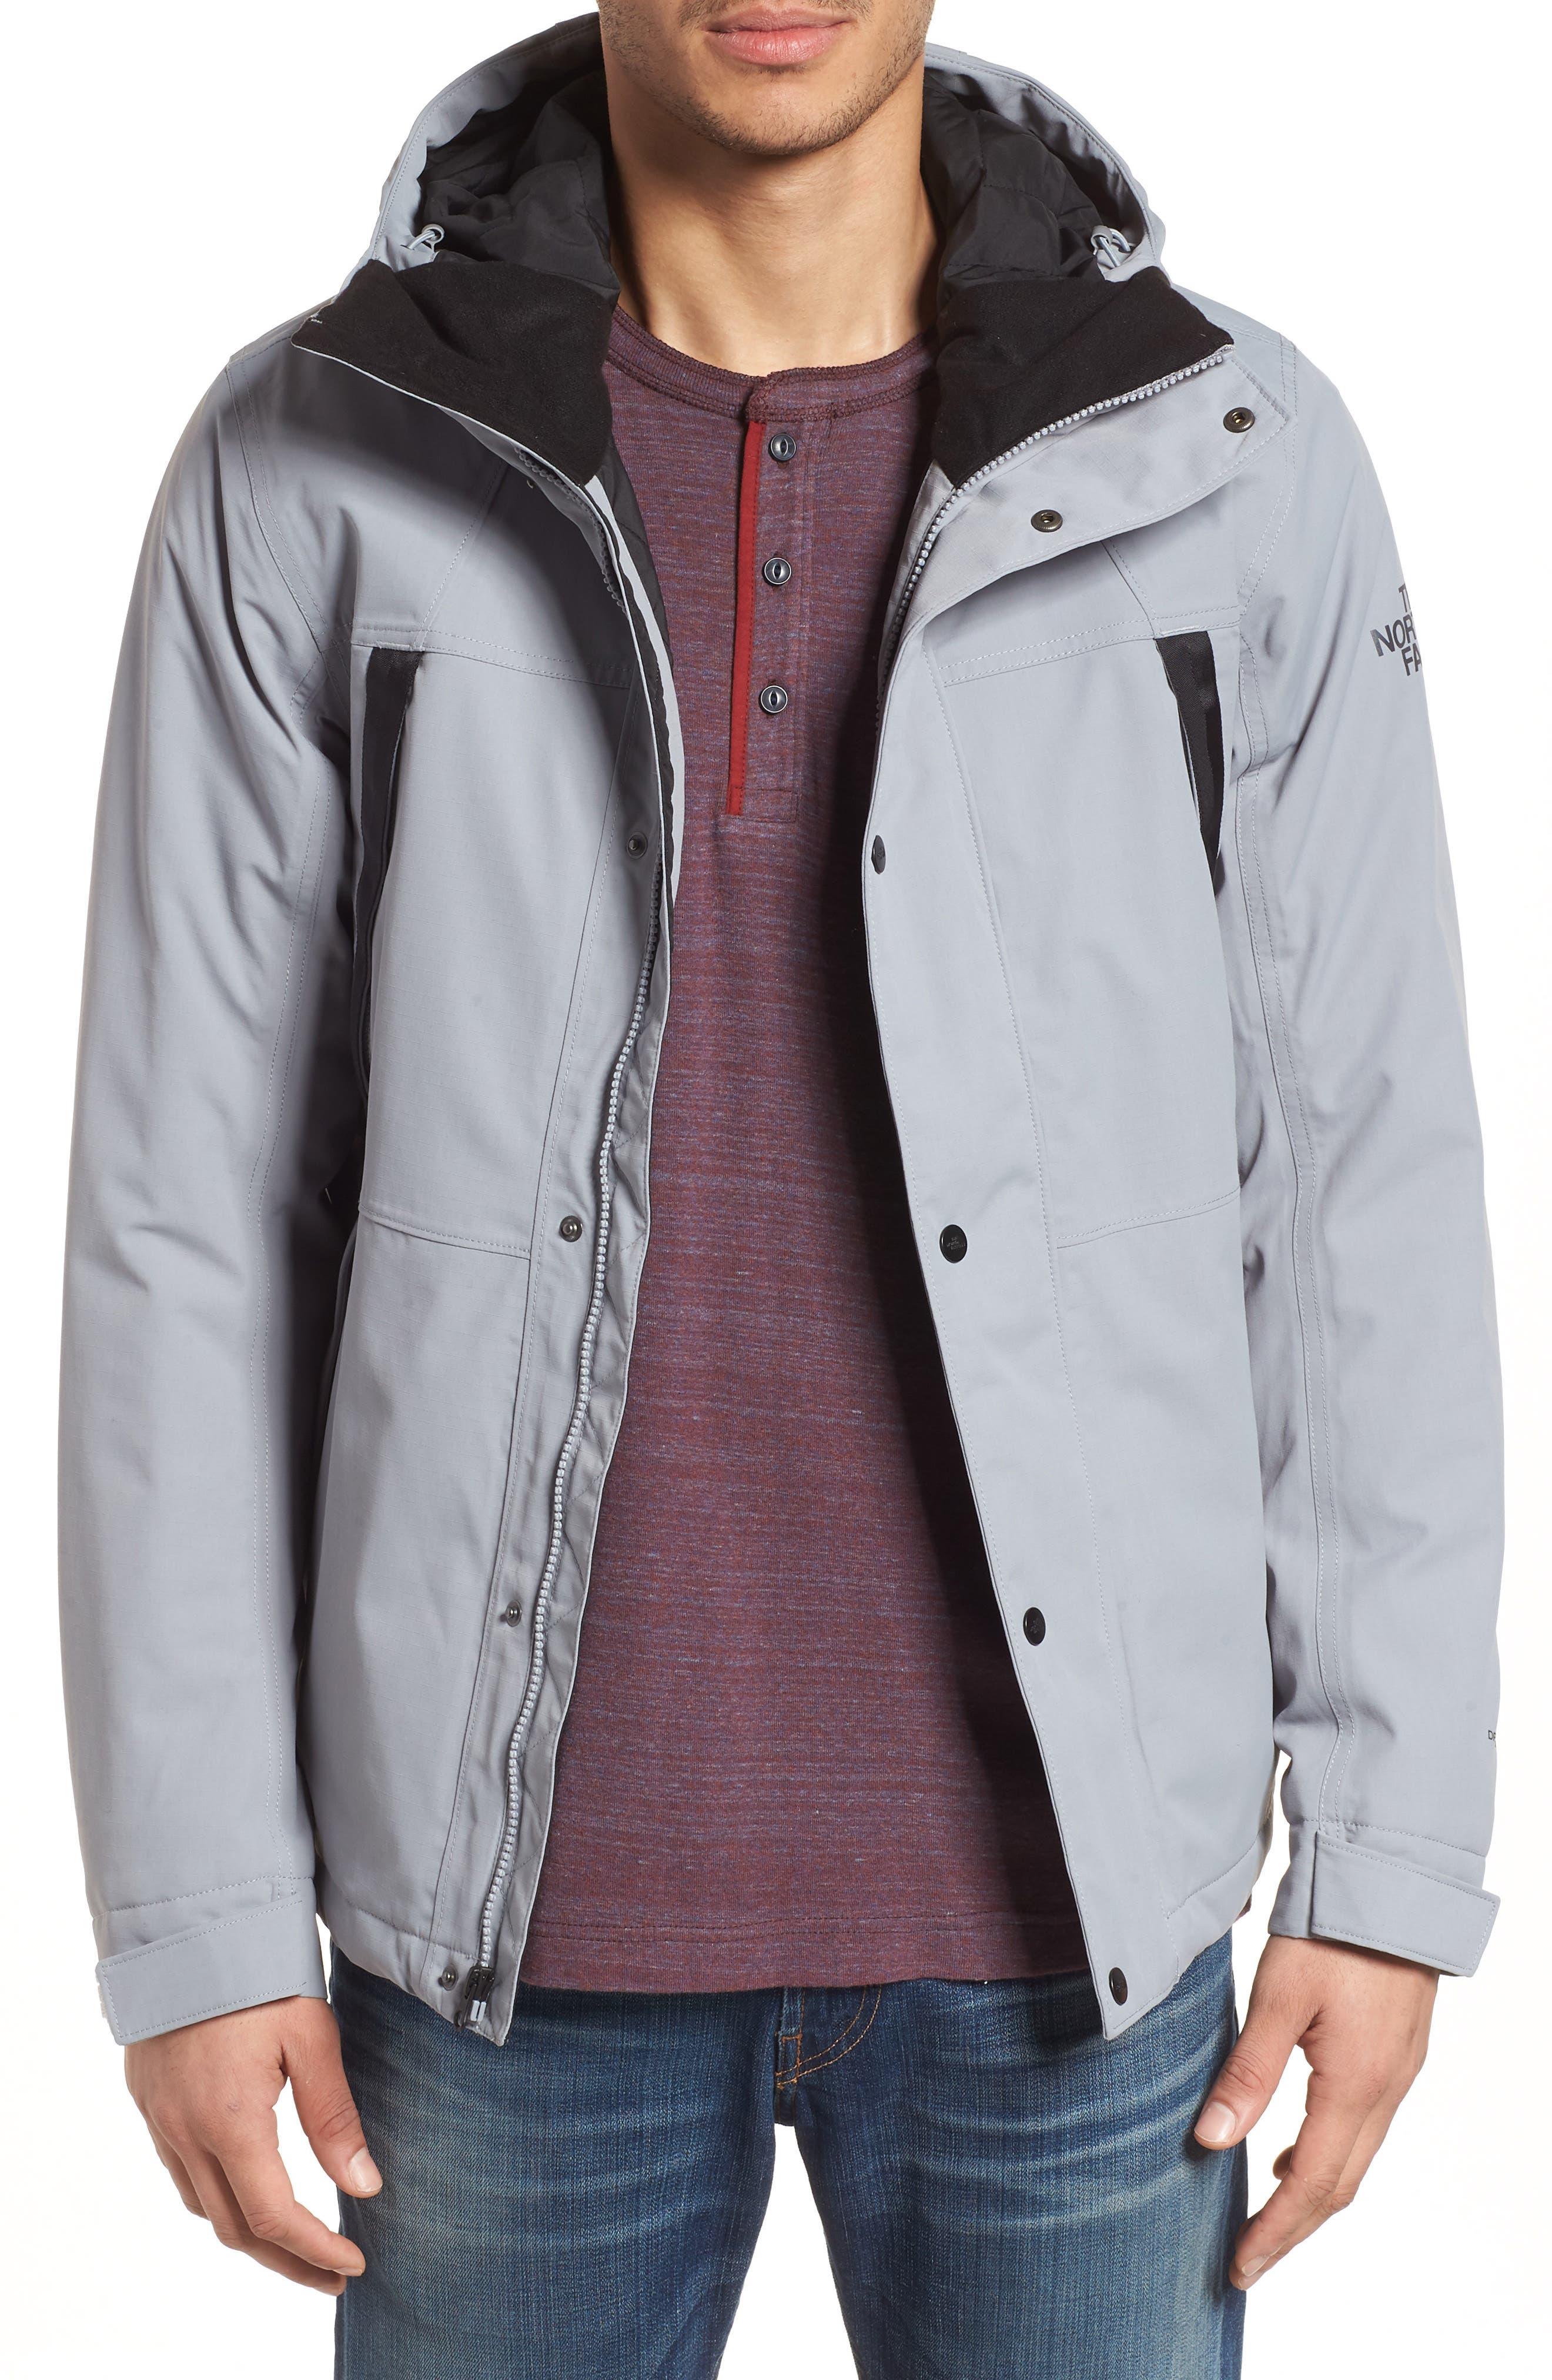 Stetler Insulated Rain Jacket,                             Main thumbnail 1, color,                             MID GREY